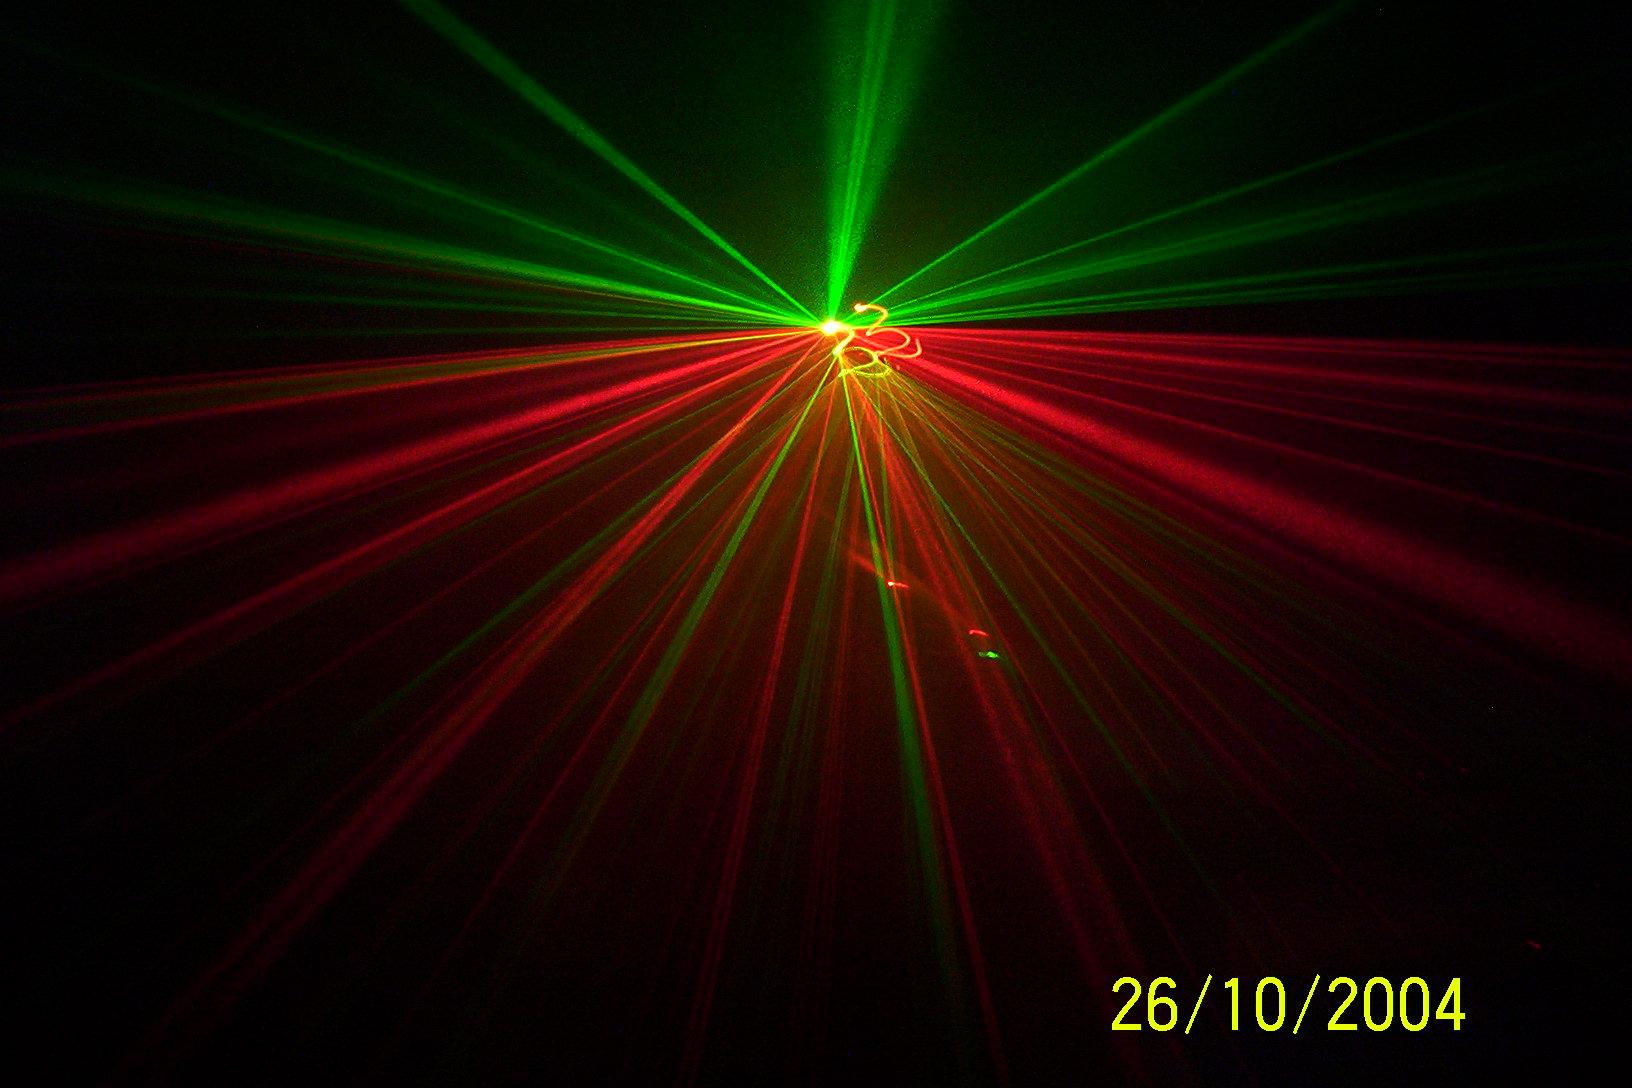 Image 2 of 21  -  247 kB